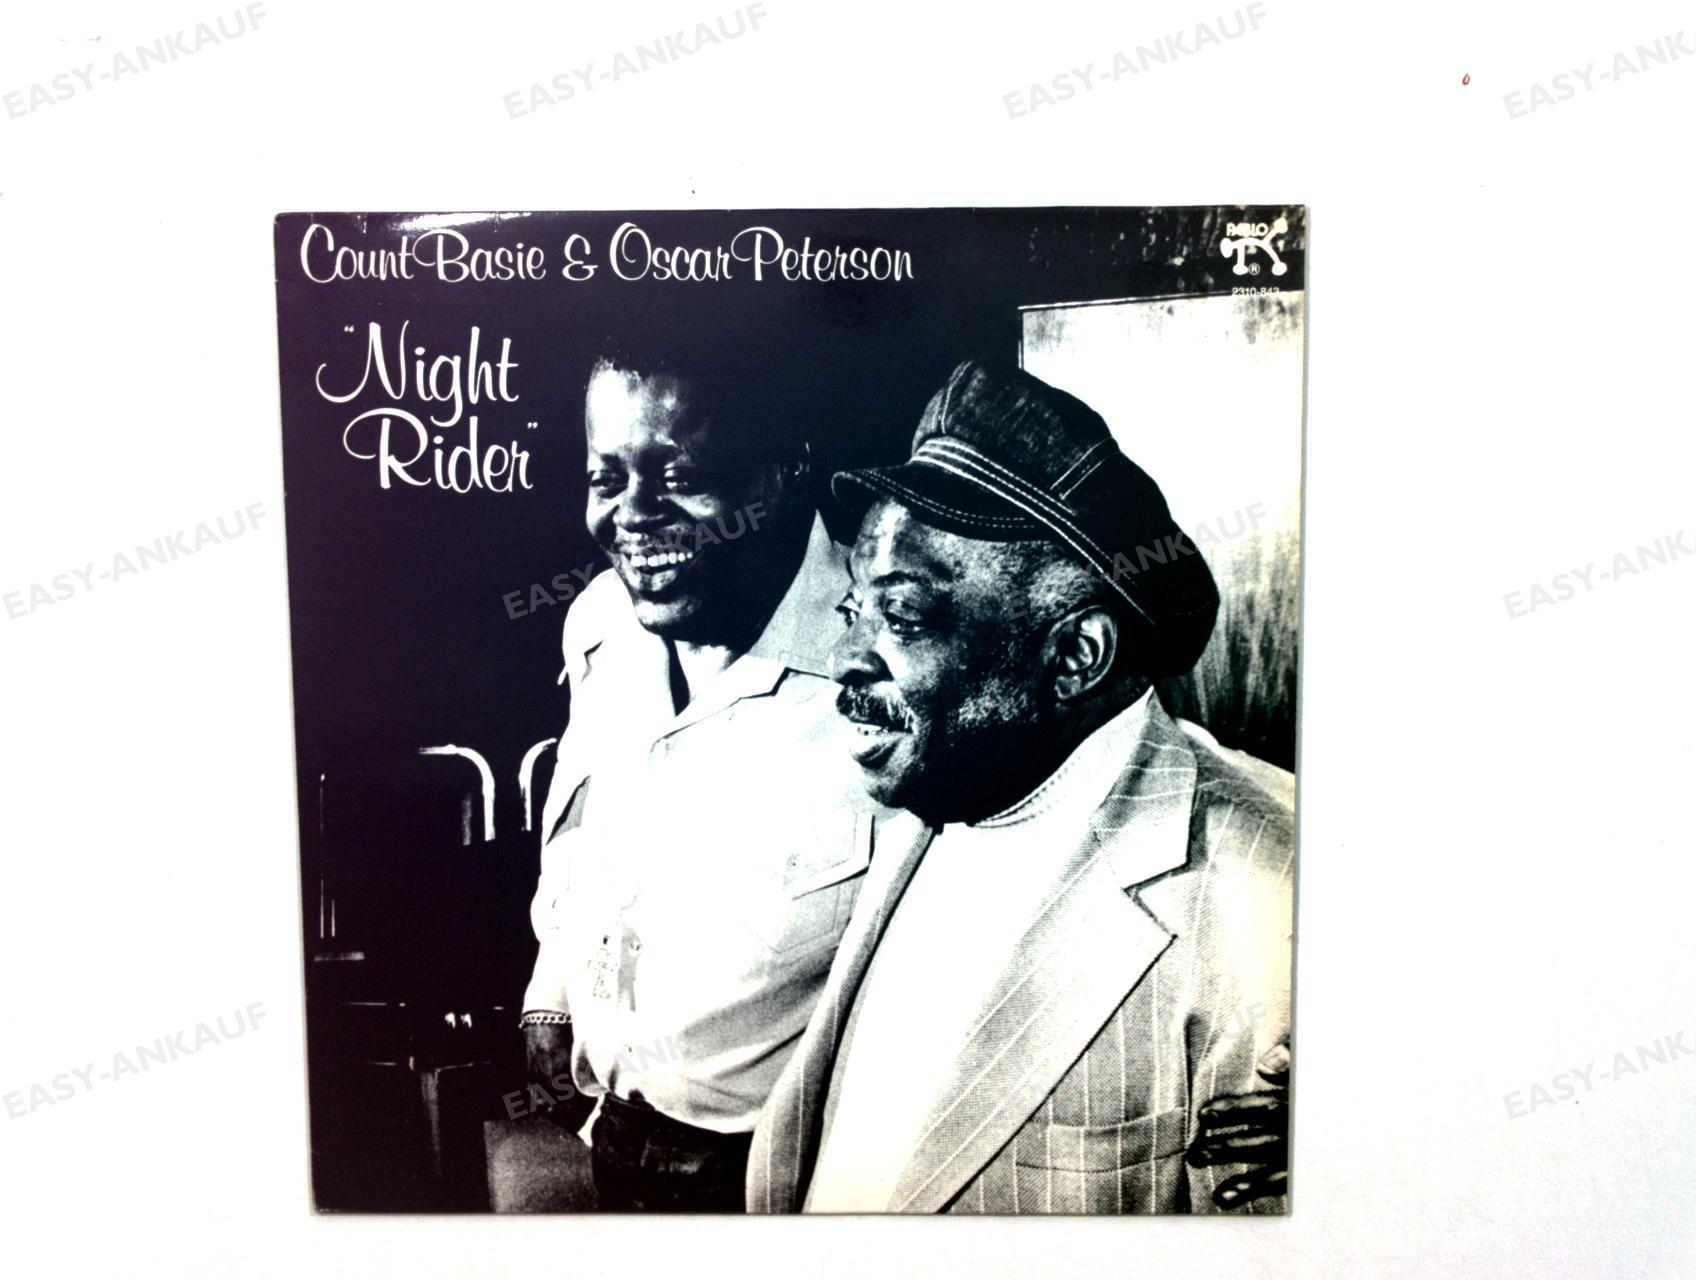 Count Basie & Oscar Peterson - Night Rider GER LP 1980 /3